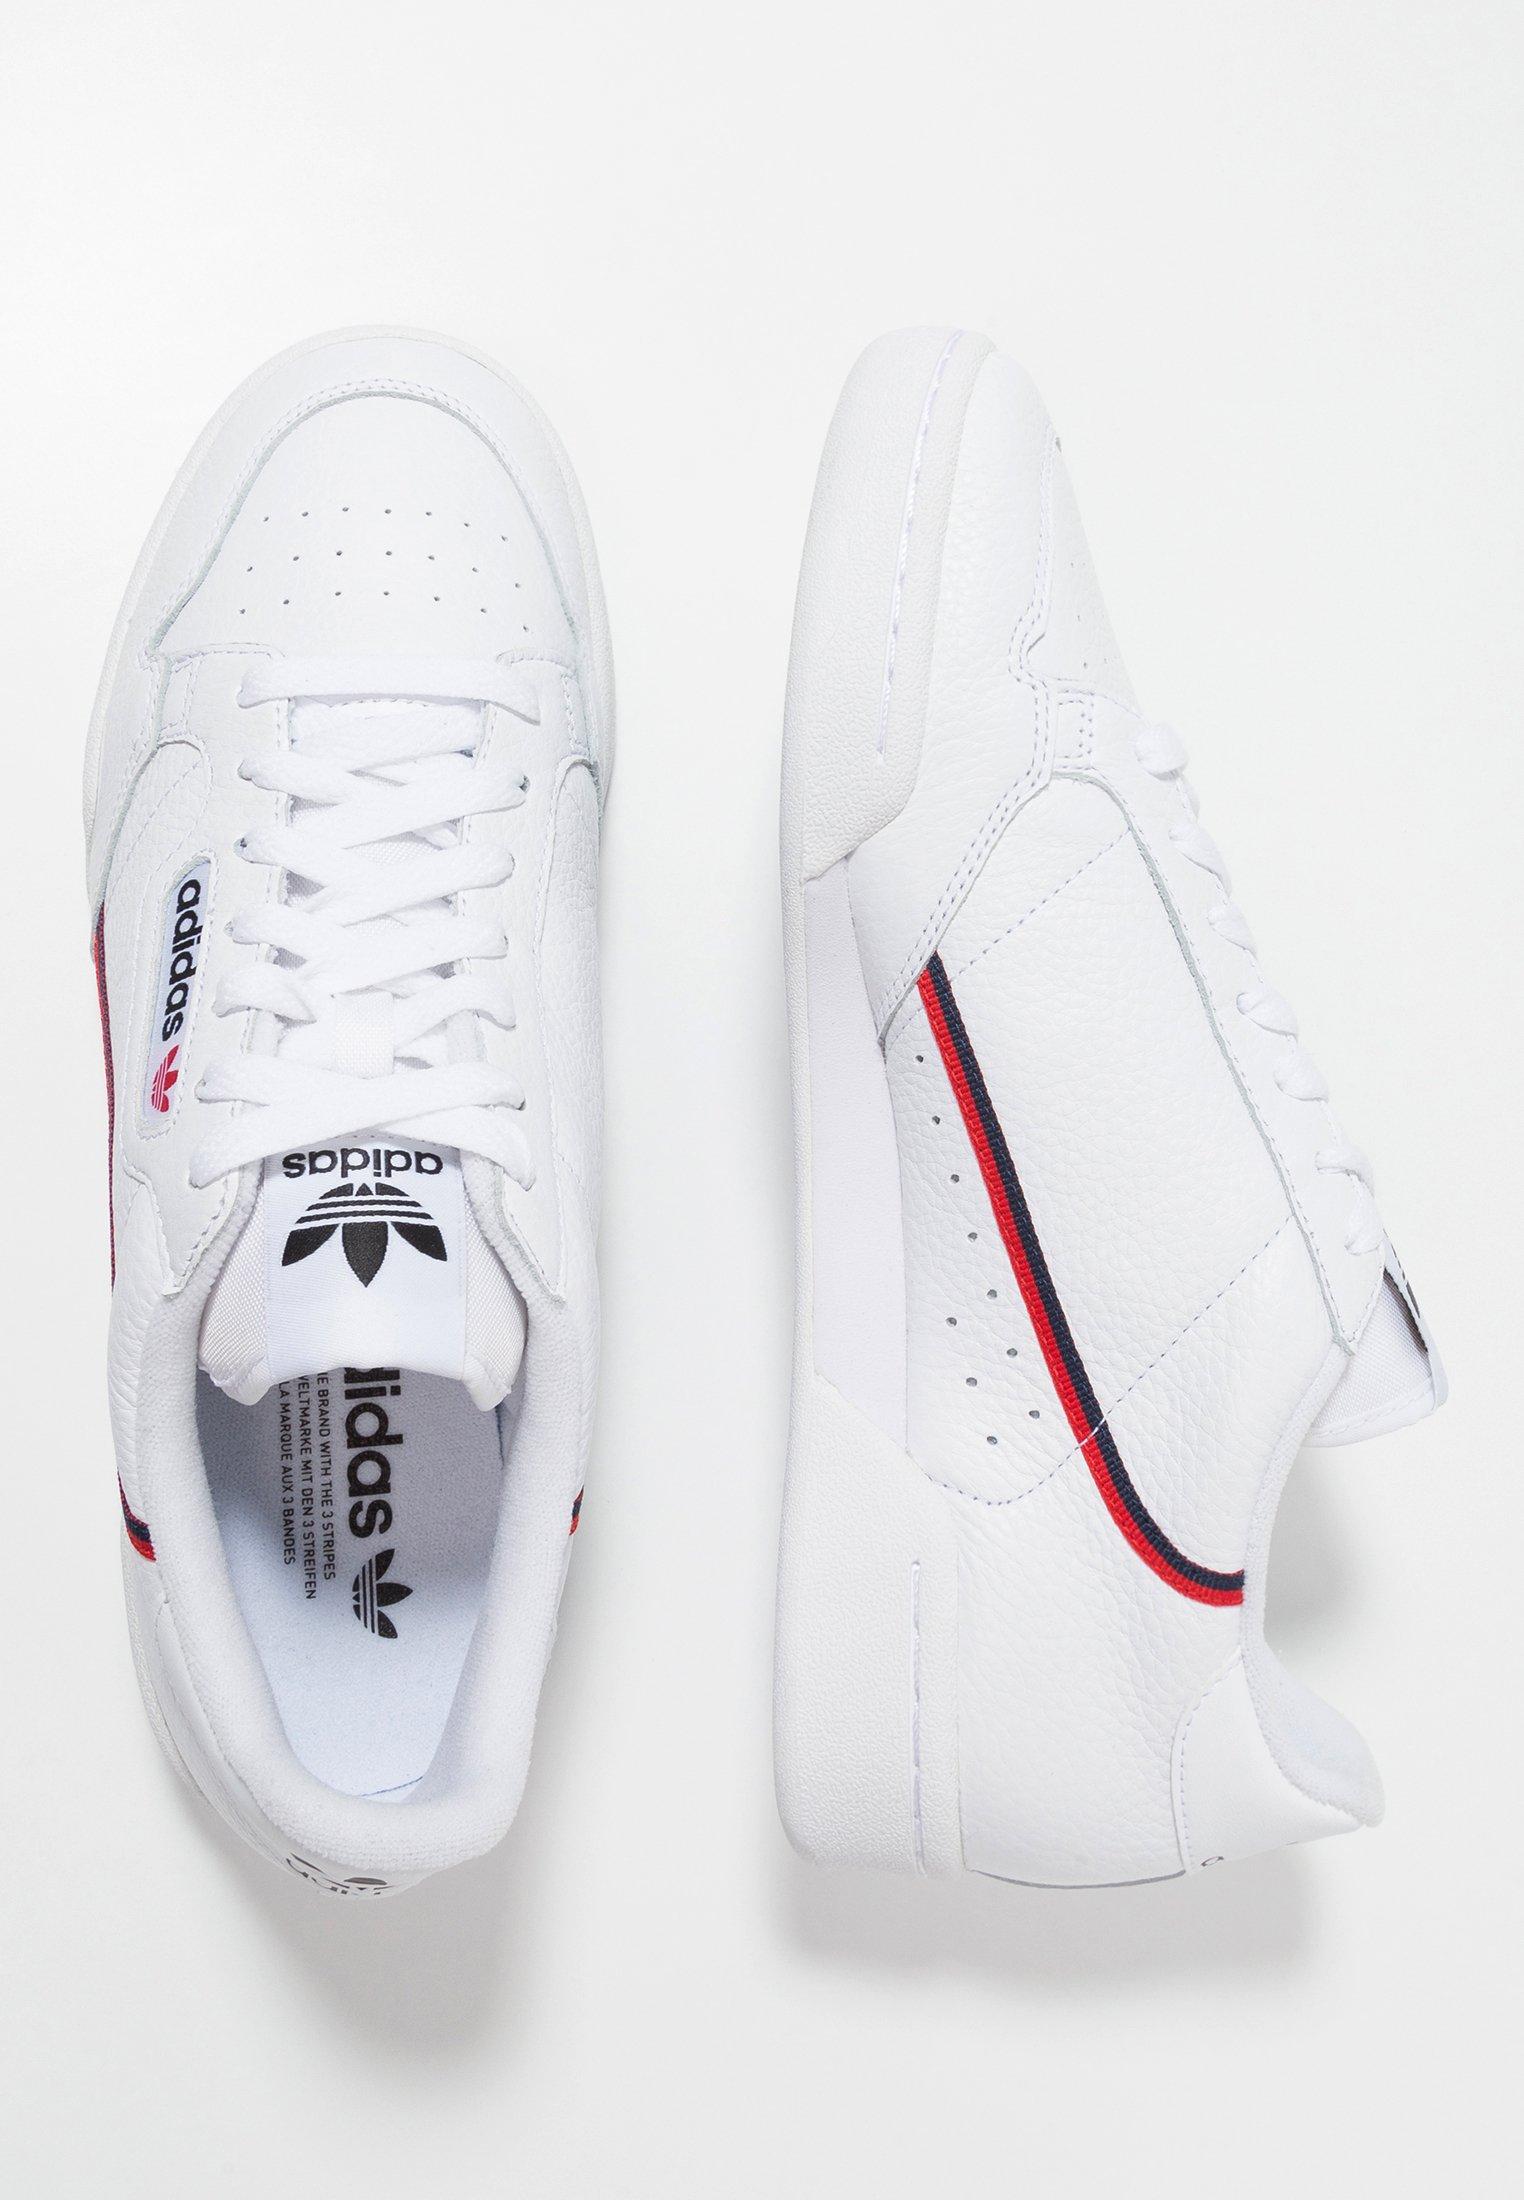 Adidas Originals Continental 80 Skateboard Shoes - Joggesko Footwear White/scarlet/collegiate Navy/hvit